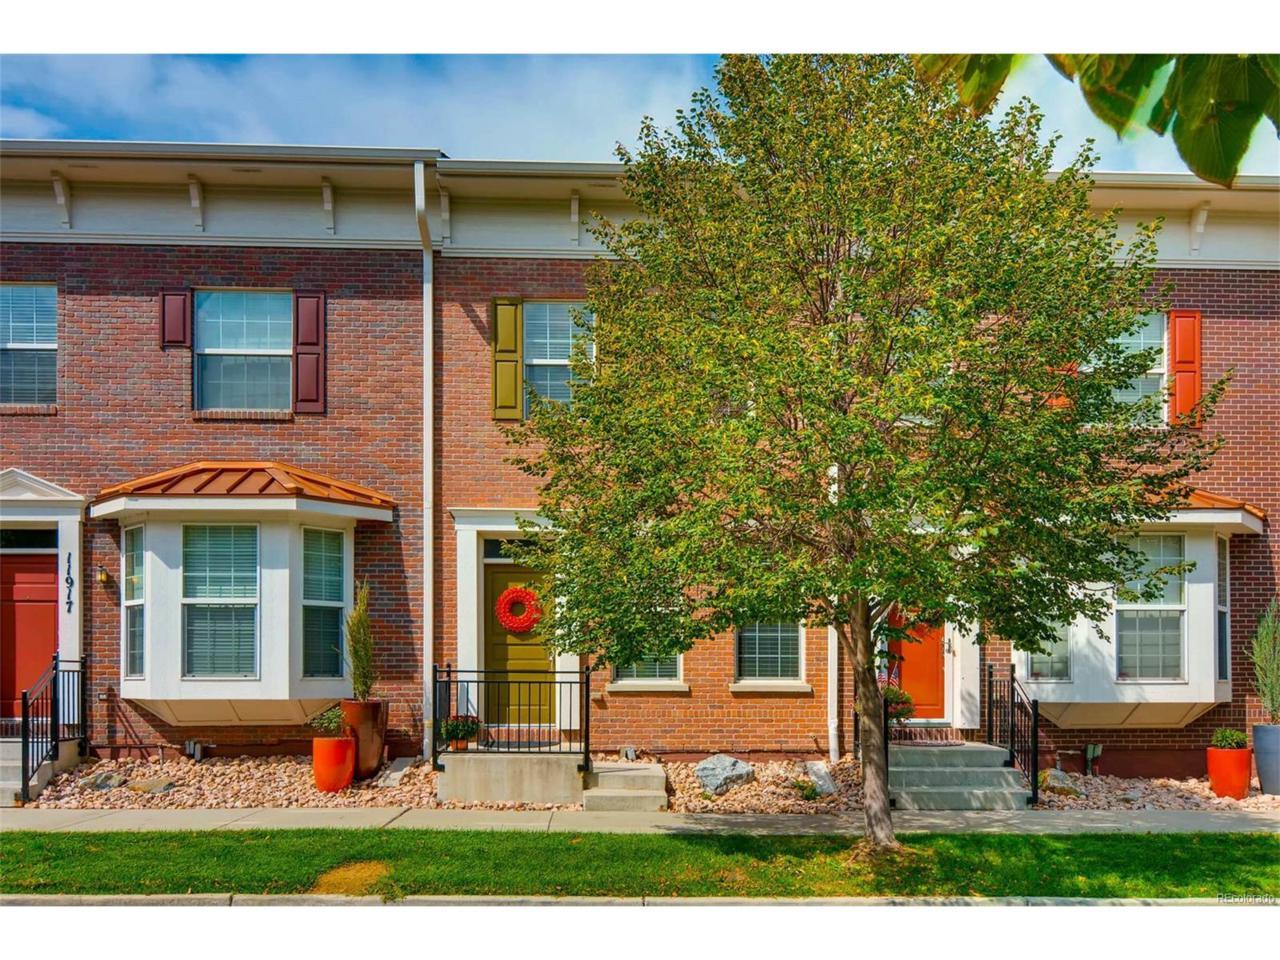 11923 Quitman Street, Westminster, CO 80031 (MLS #2892016) :: 8z Real Estate